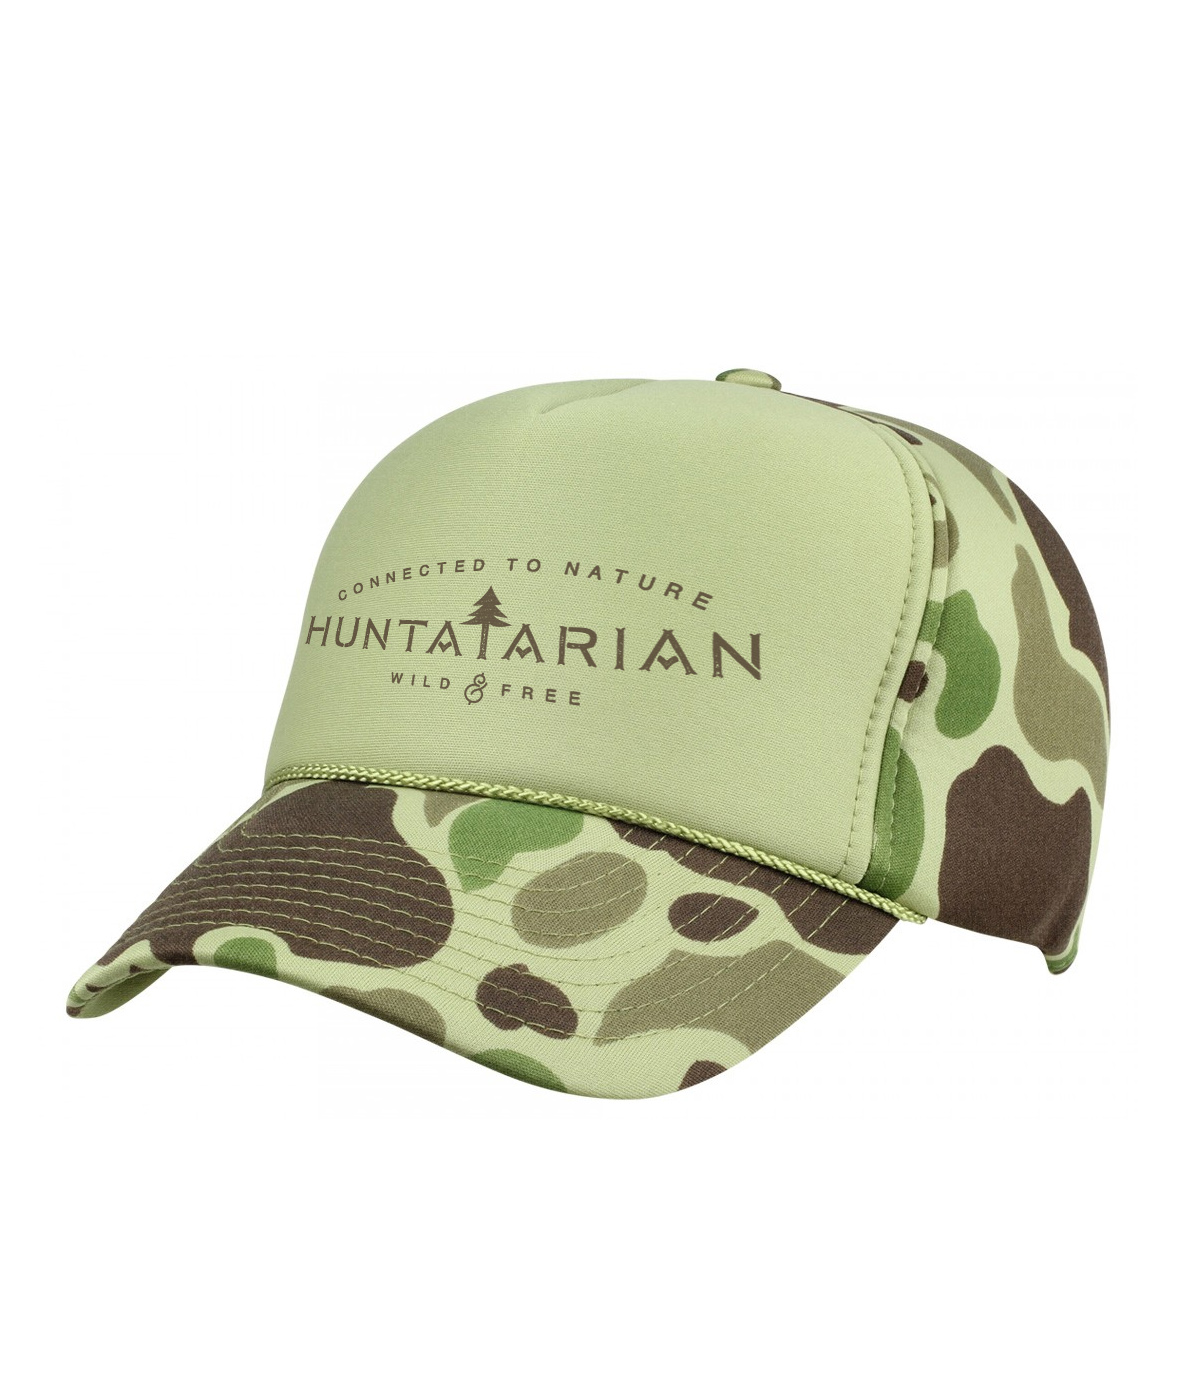 Hunatarian_hat.jpg